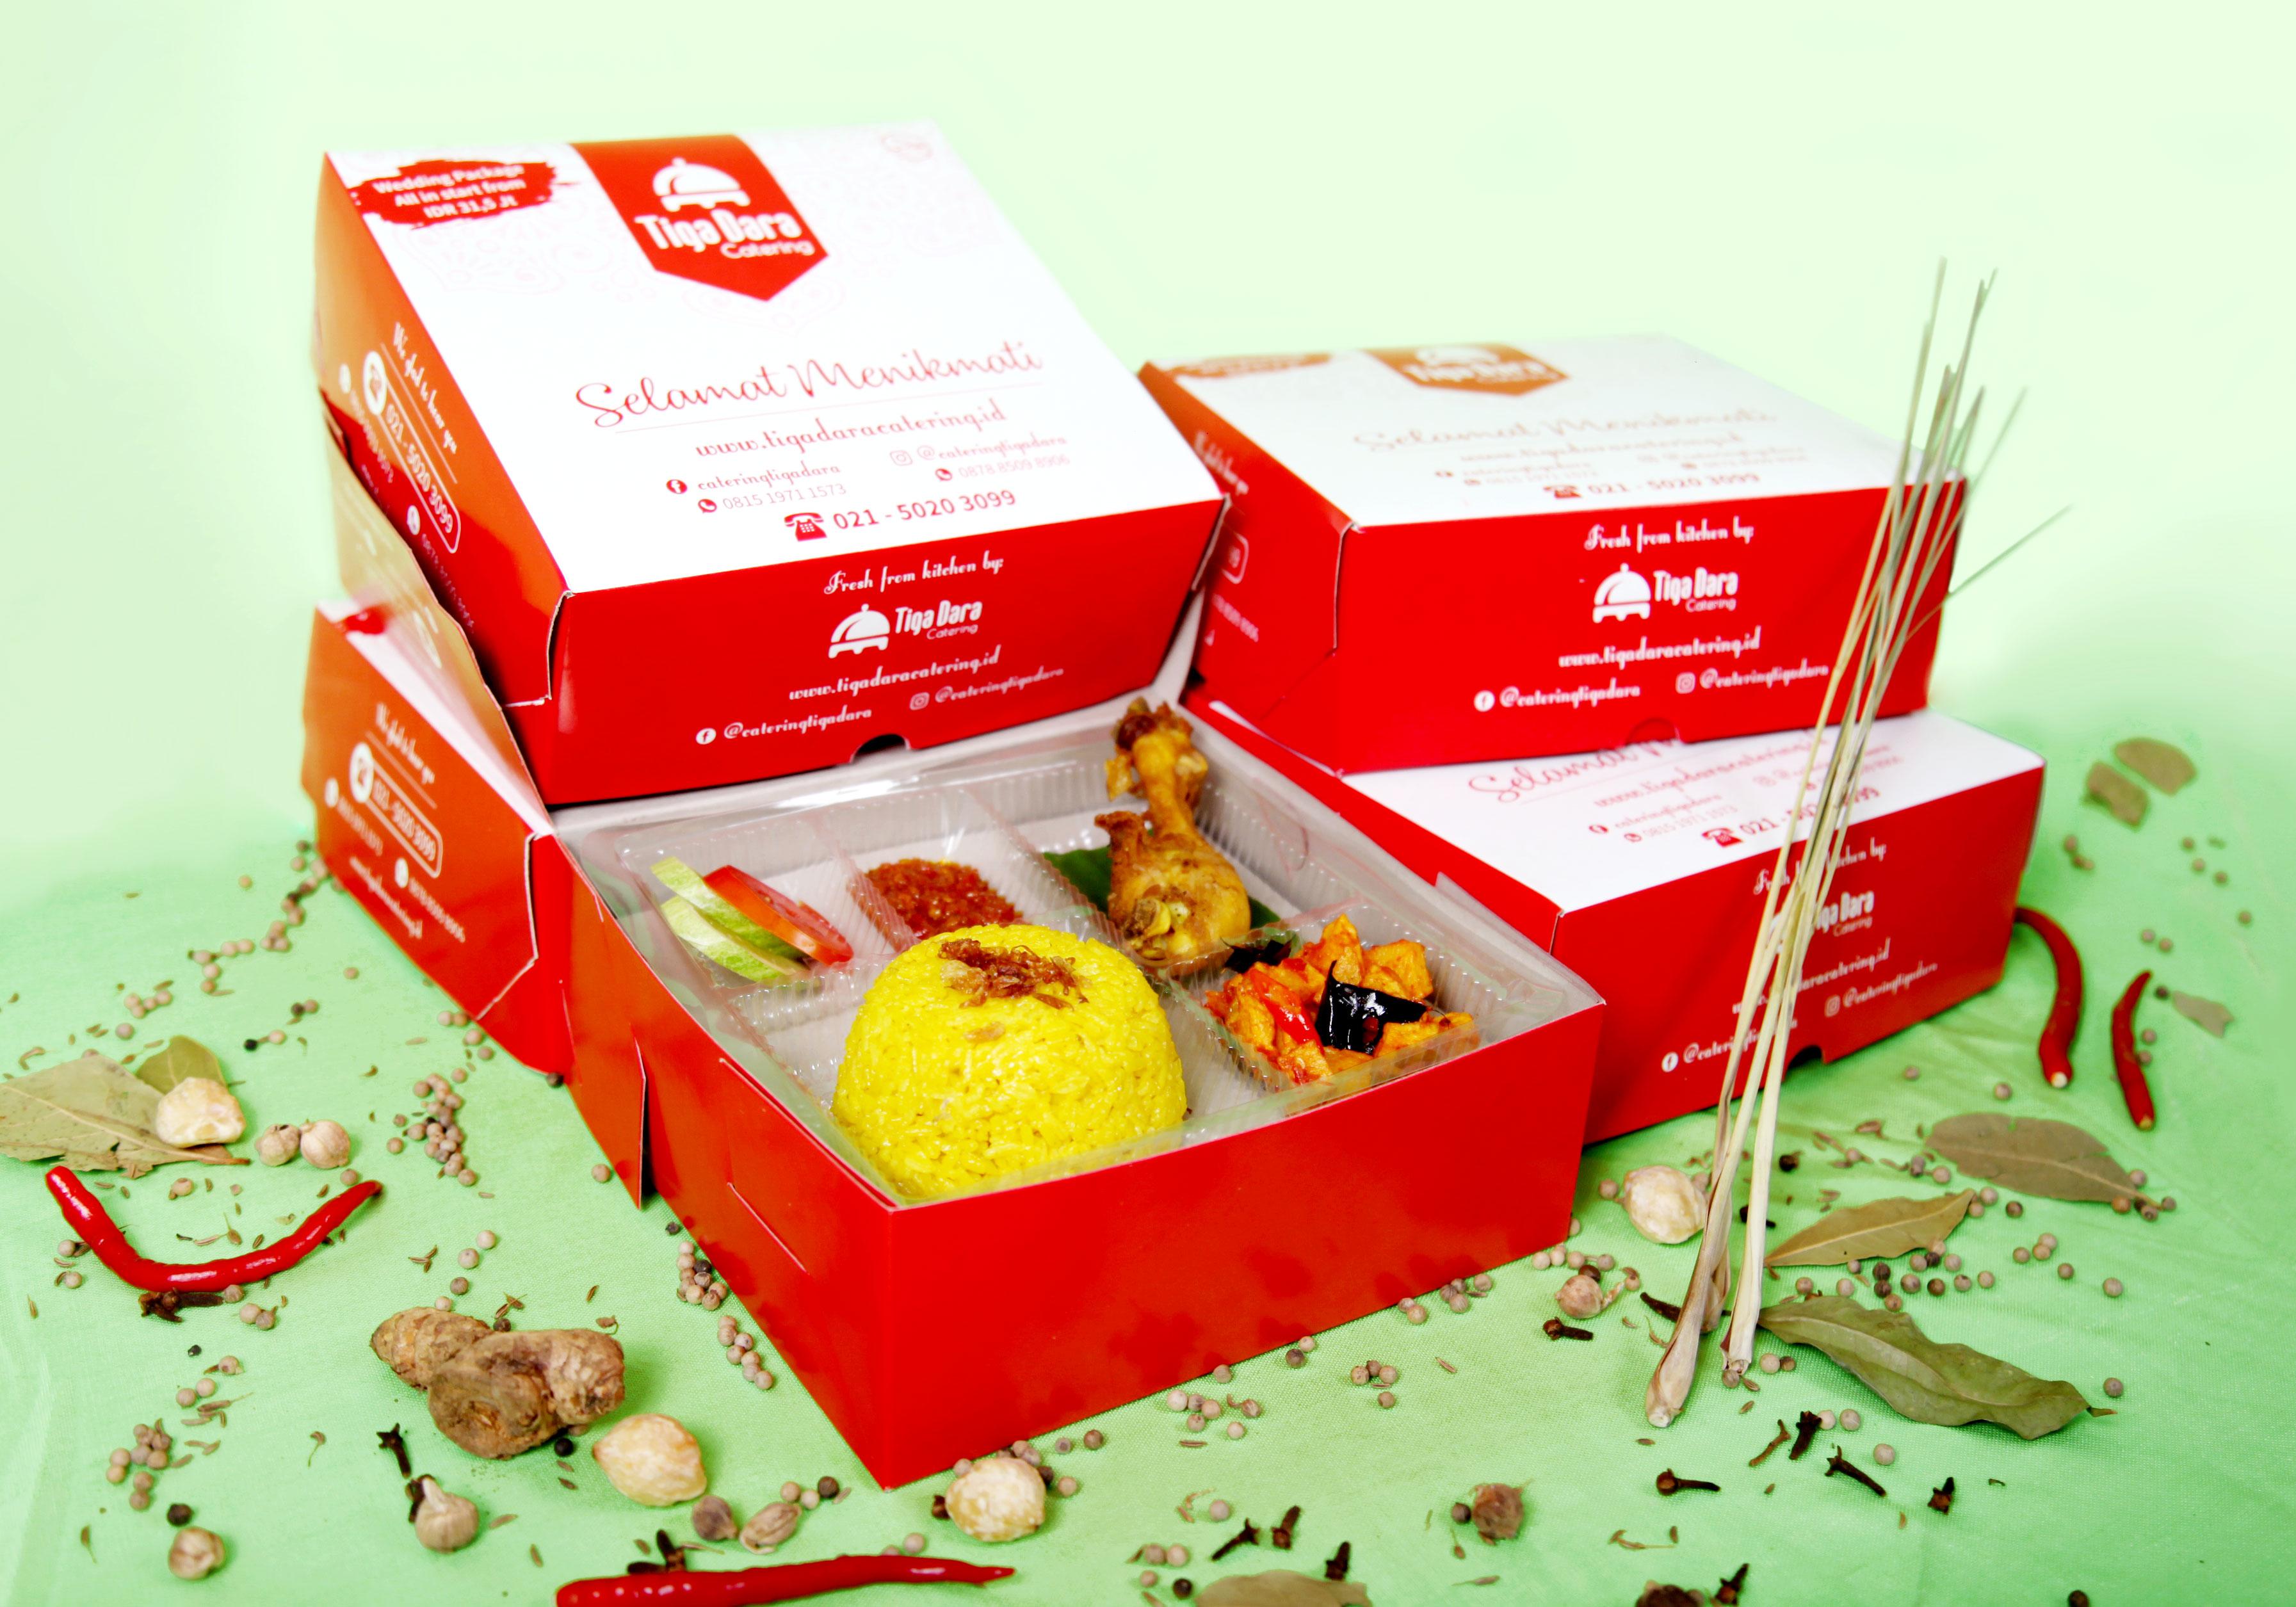 tiga_dara_*Nasi Box Enak & Murah_Economy Class | Paket 5